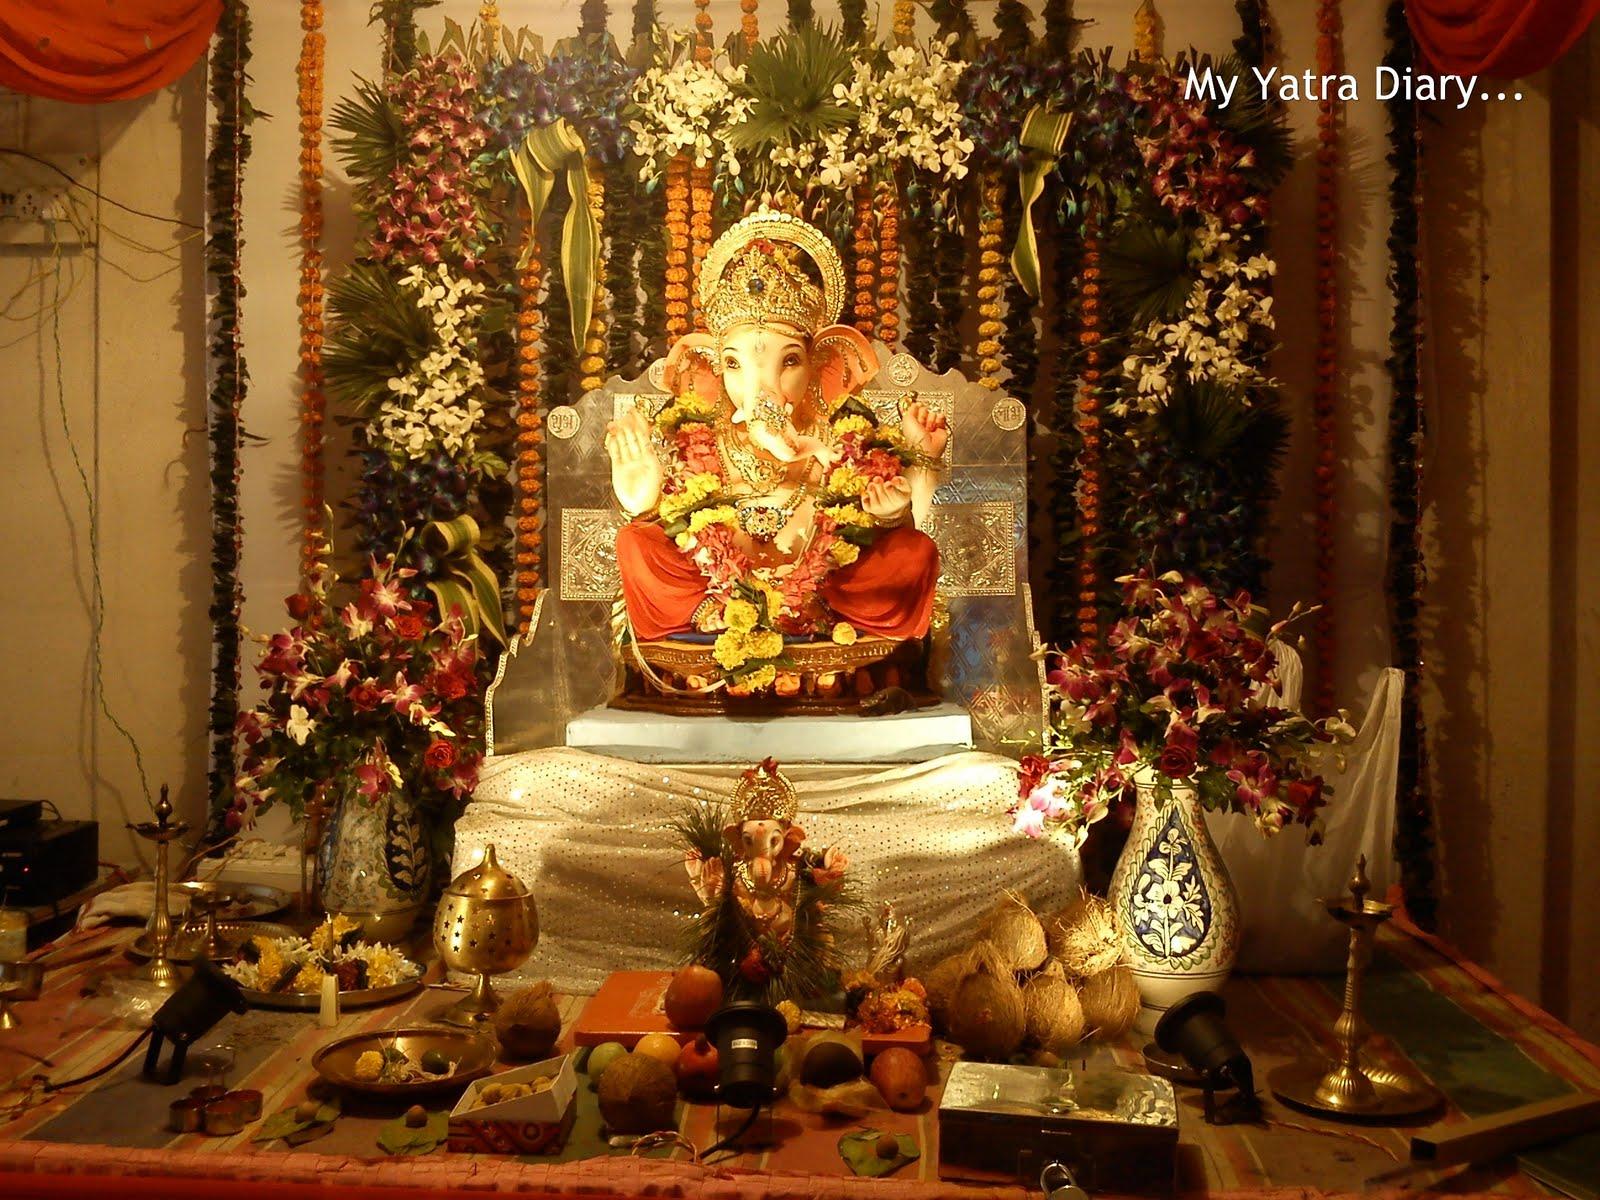 Ganesh chaturthi flowers may flower blog - Complete Ganpati Pandal Decorations During The Ganesh Chaturthi Festival